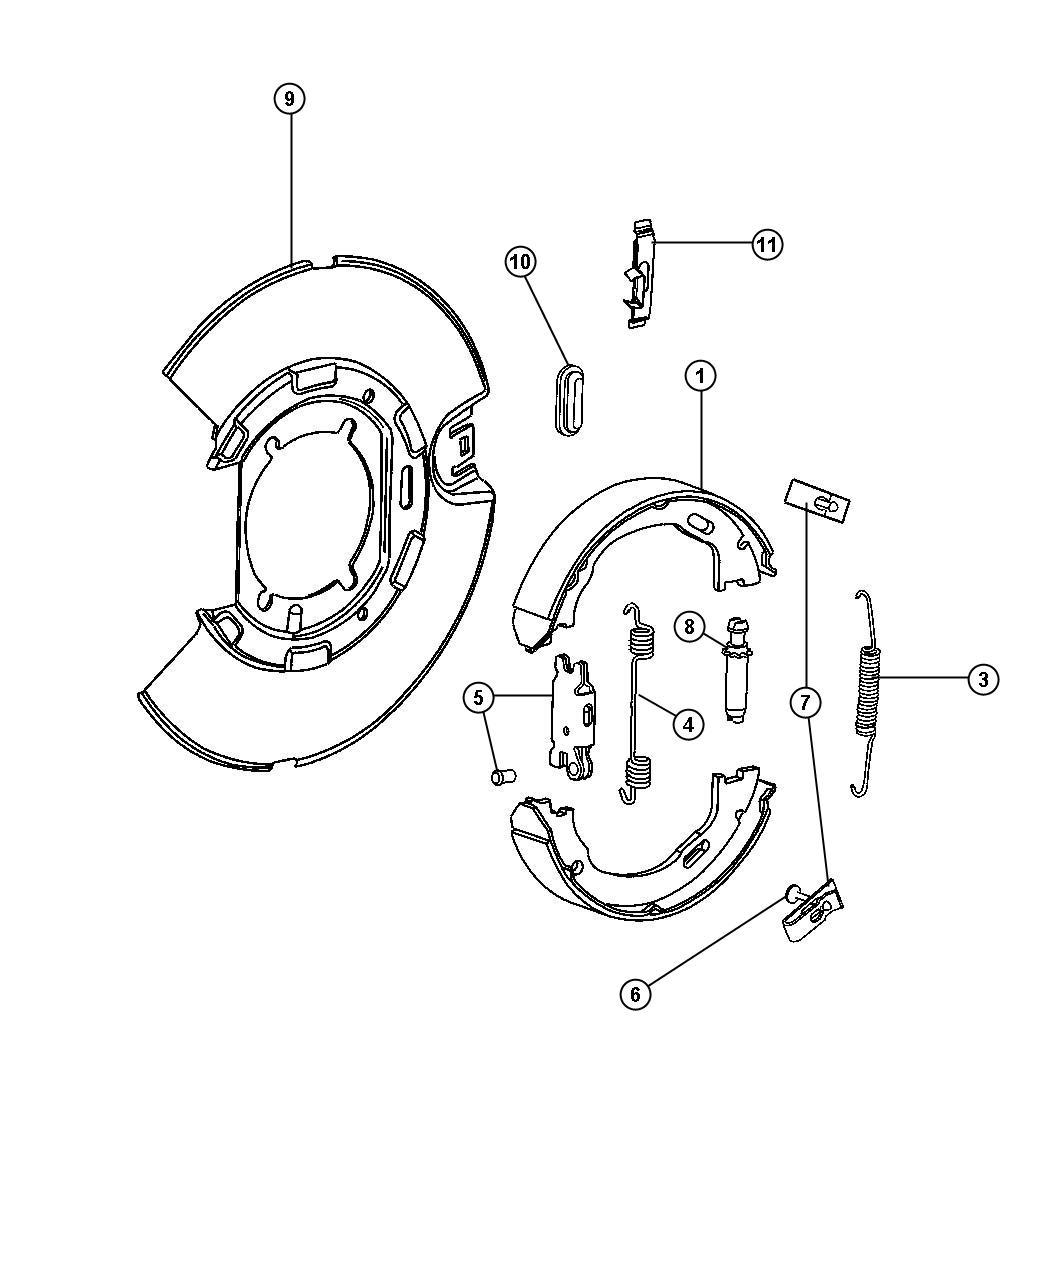 Service manual [2010 Chrysler 300 Brake Replacement System